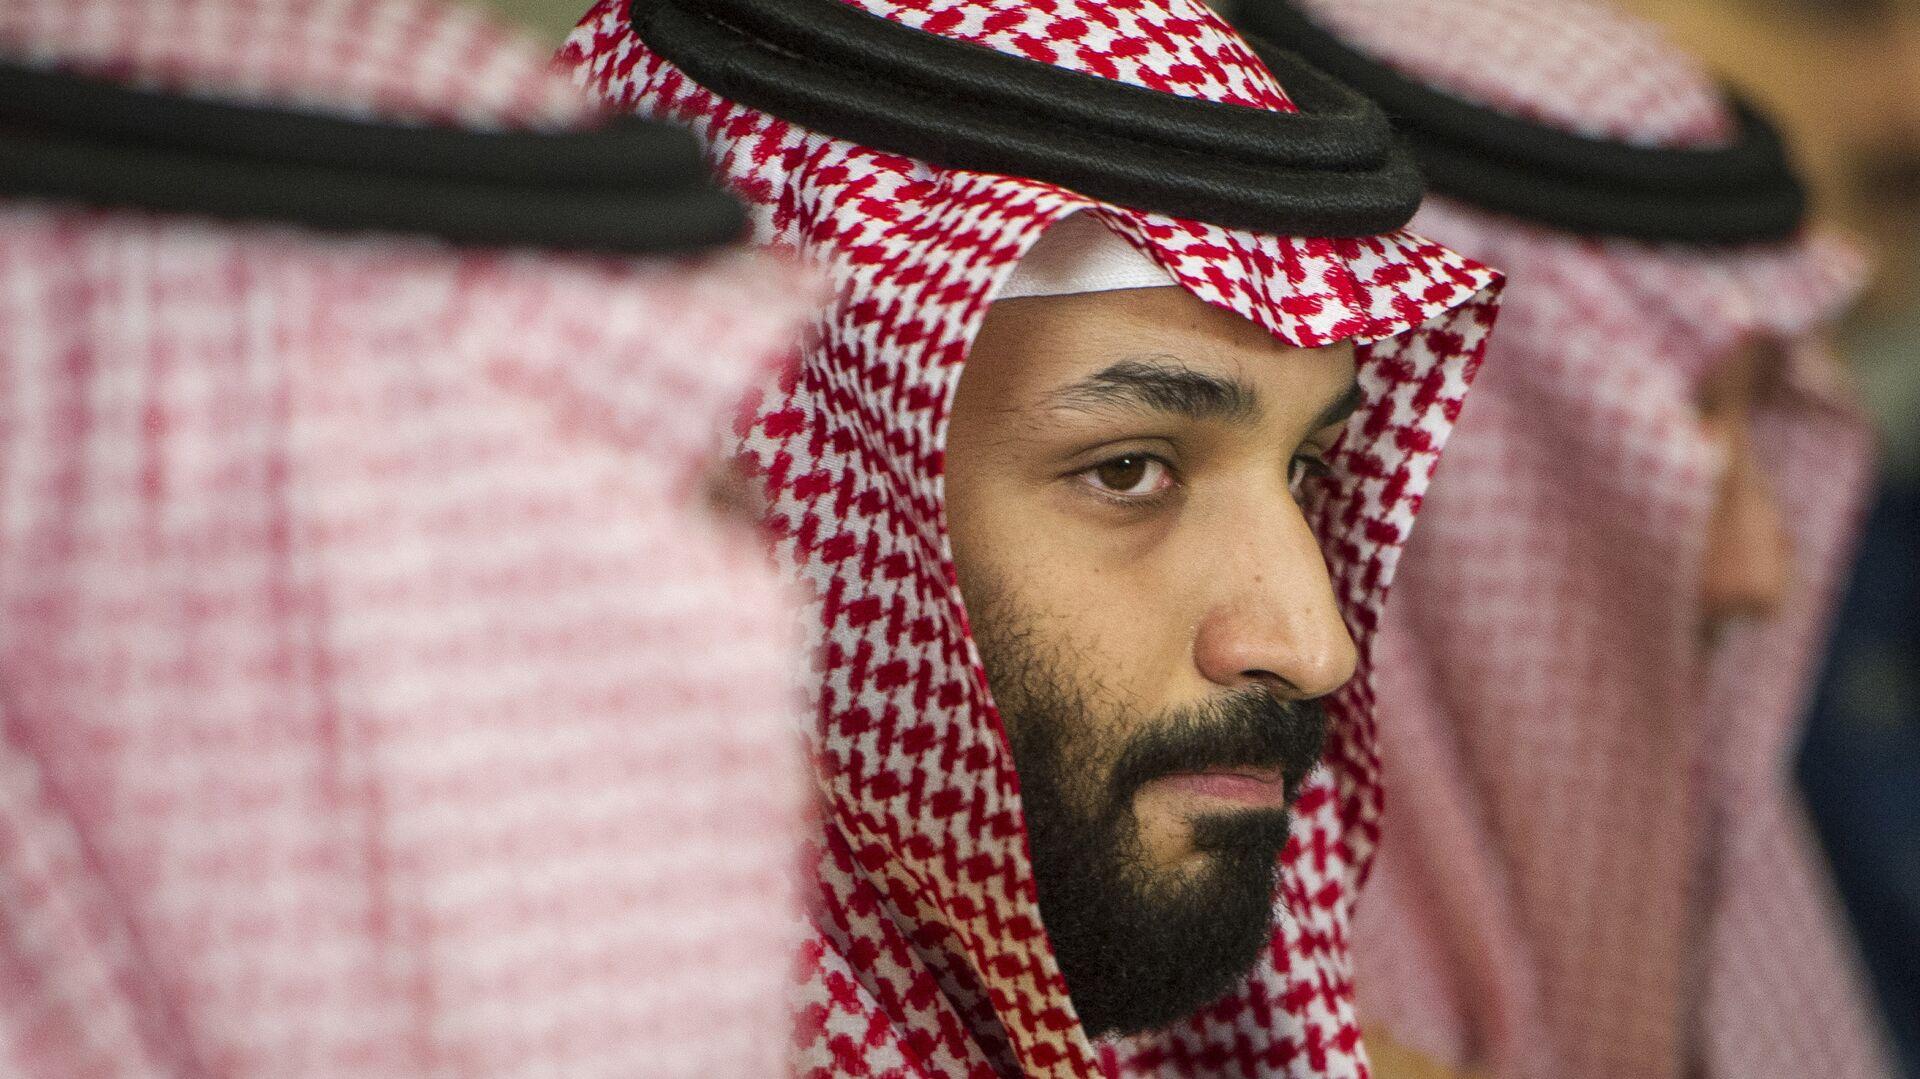 Mohamed bin Salman, príncipe heredero de Arabia Saudí - Sputnik Mundo, 1920, 01.03.2021